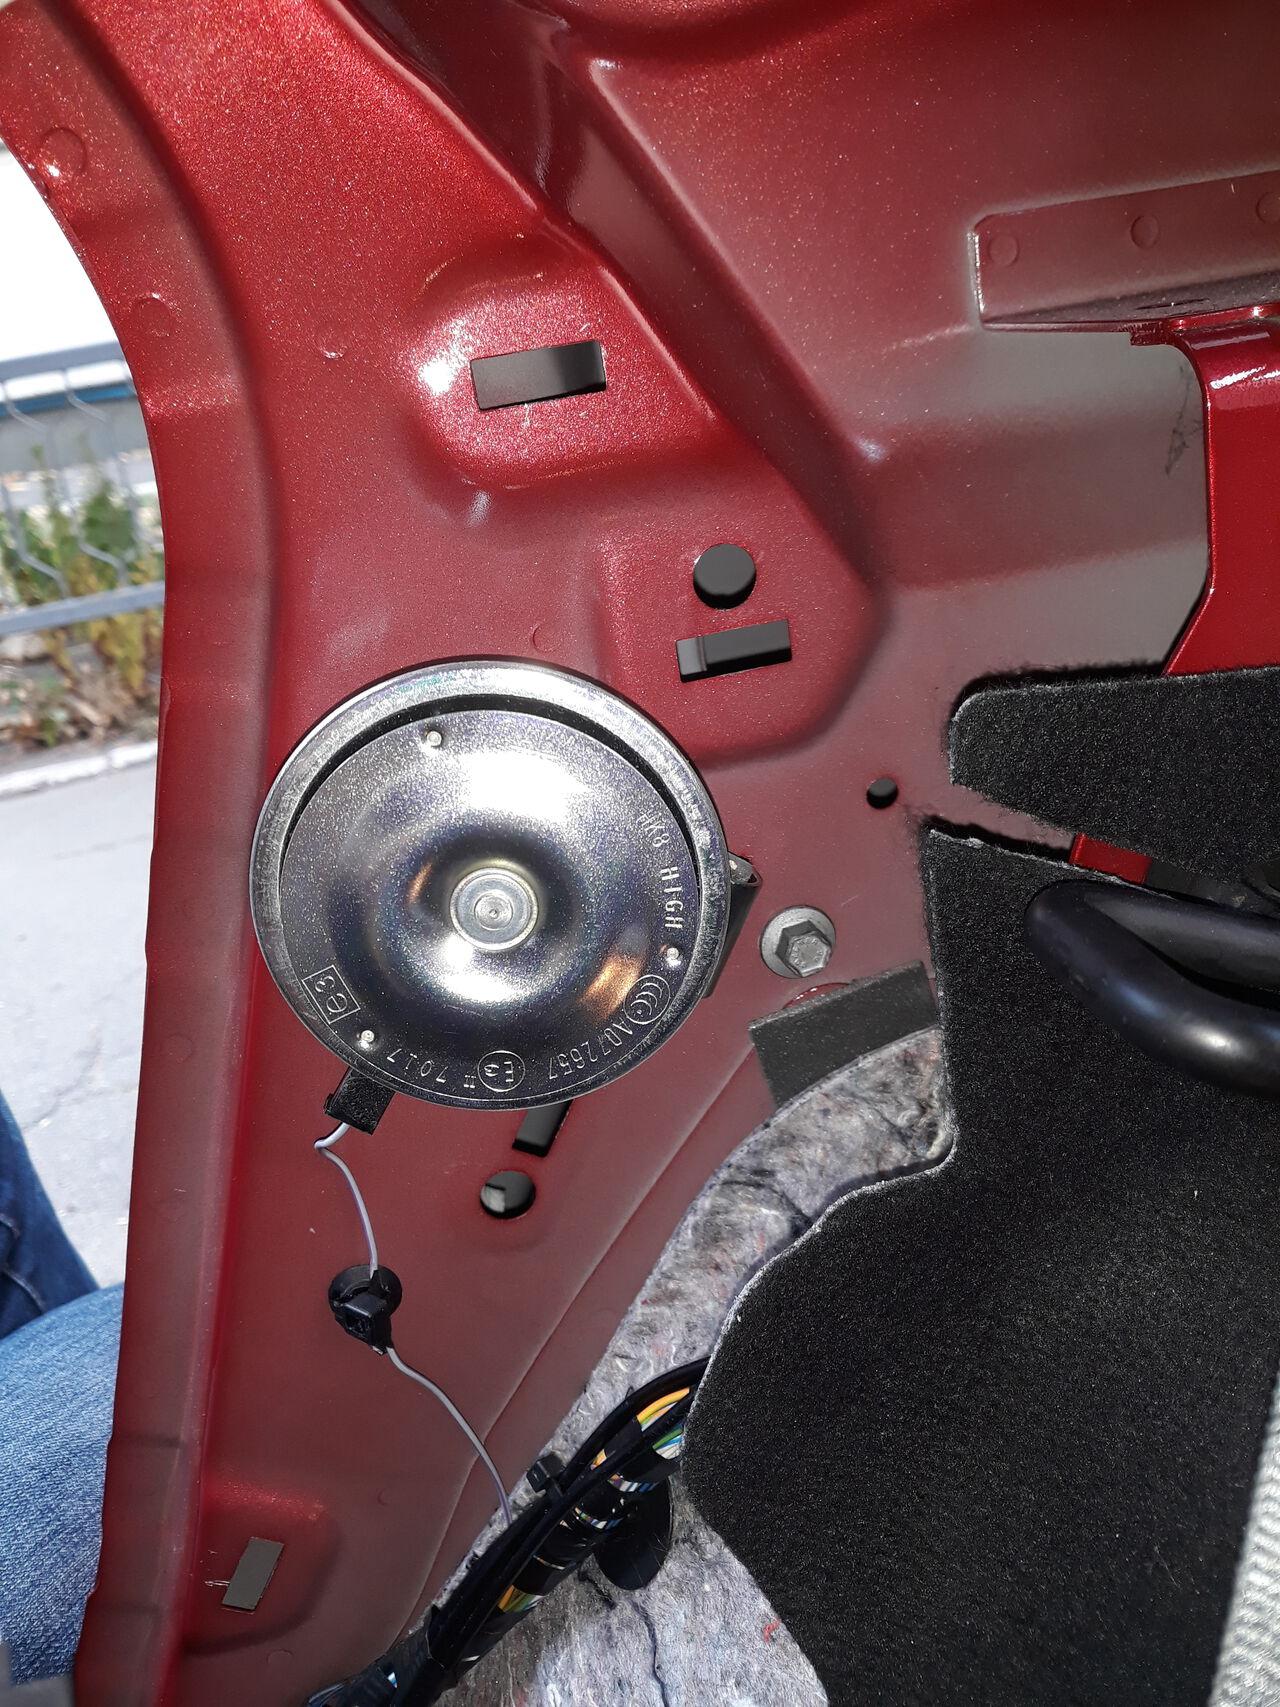 Ford Focus III - Alarm Hupe Innenraum - Bild 6.jpg